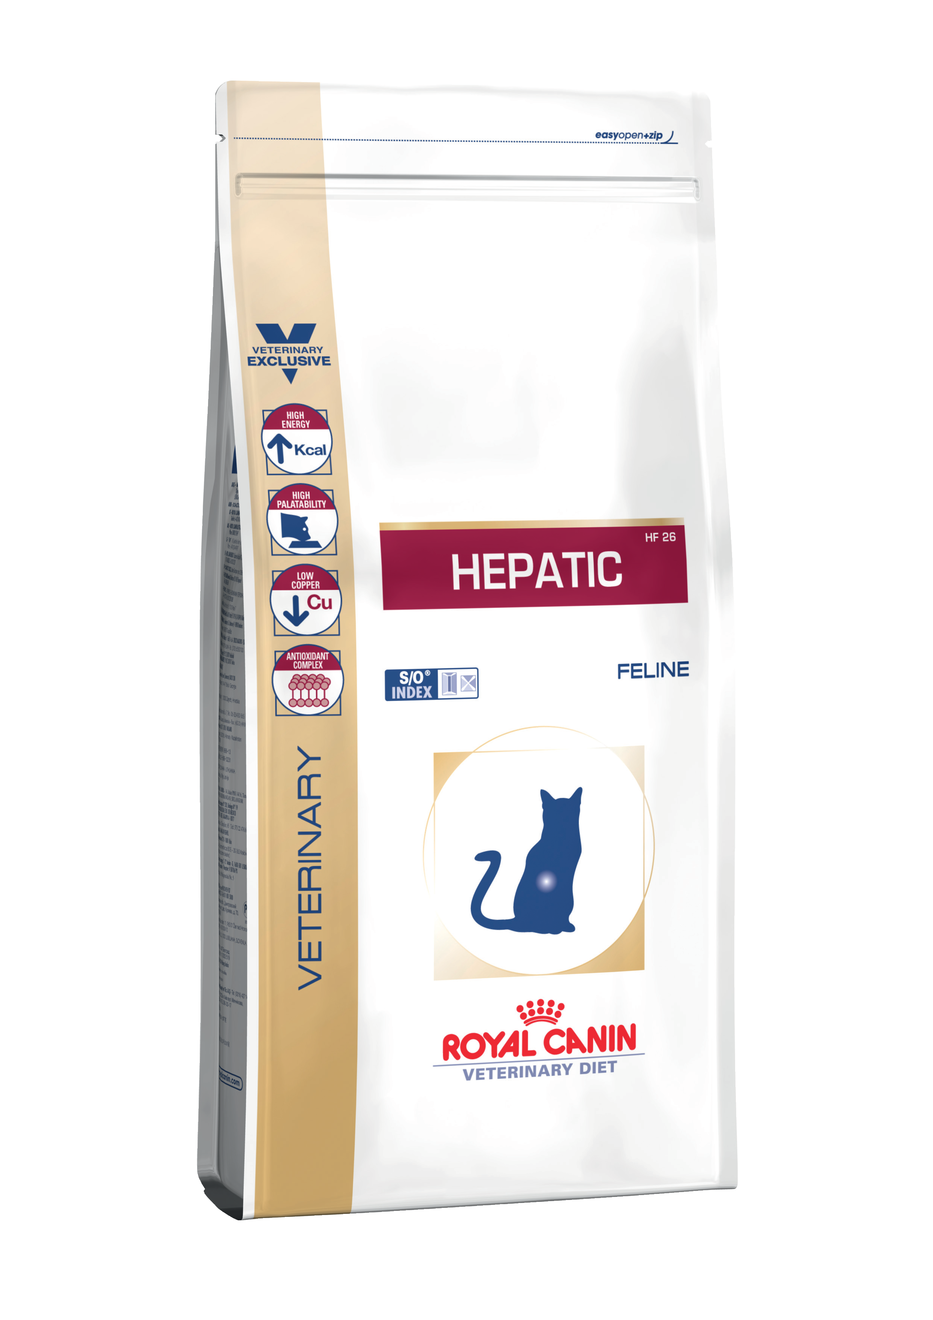 Royal canin veterinary diet cat hepatic 2kg